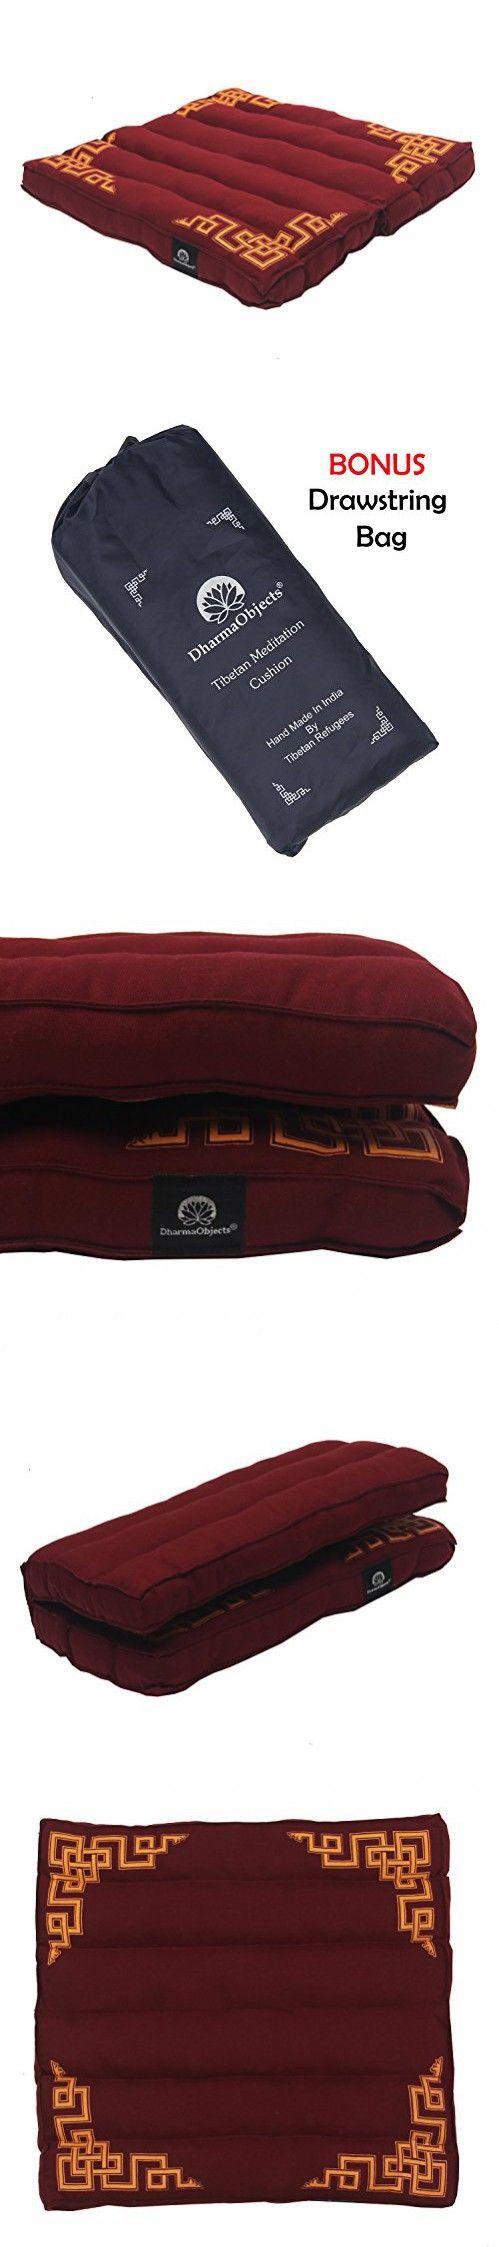 "DharmaObjects Traditional Tibetan Yoga Meditation Accessory Cotton Mat Cushion (Maroon, 15"" X 14"" X 1.5"")"